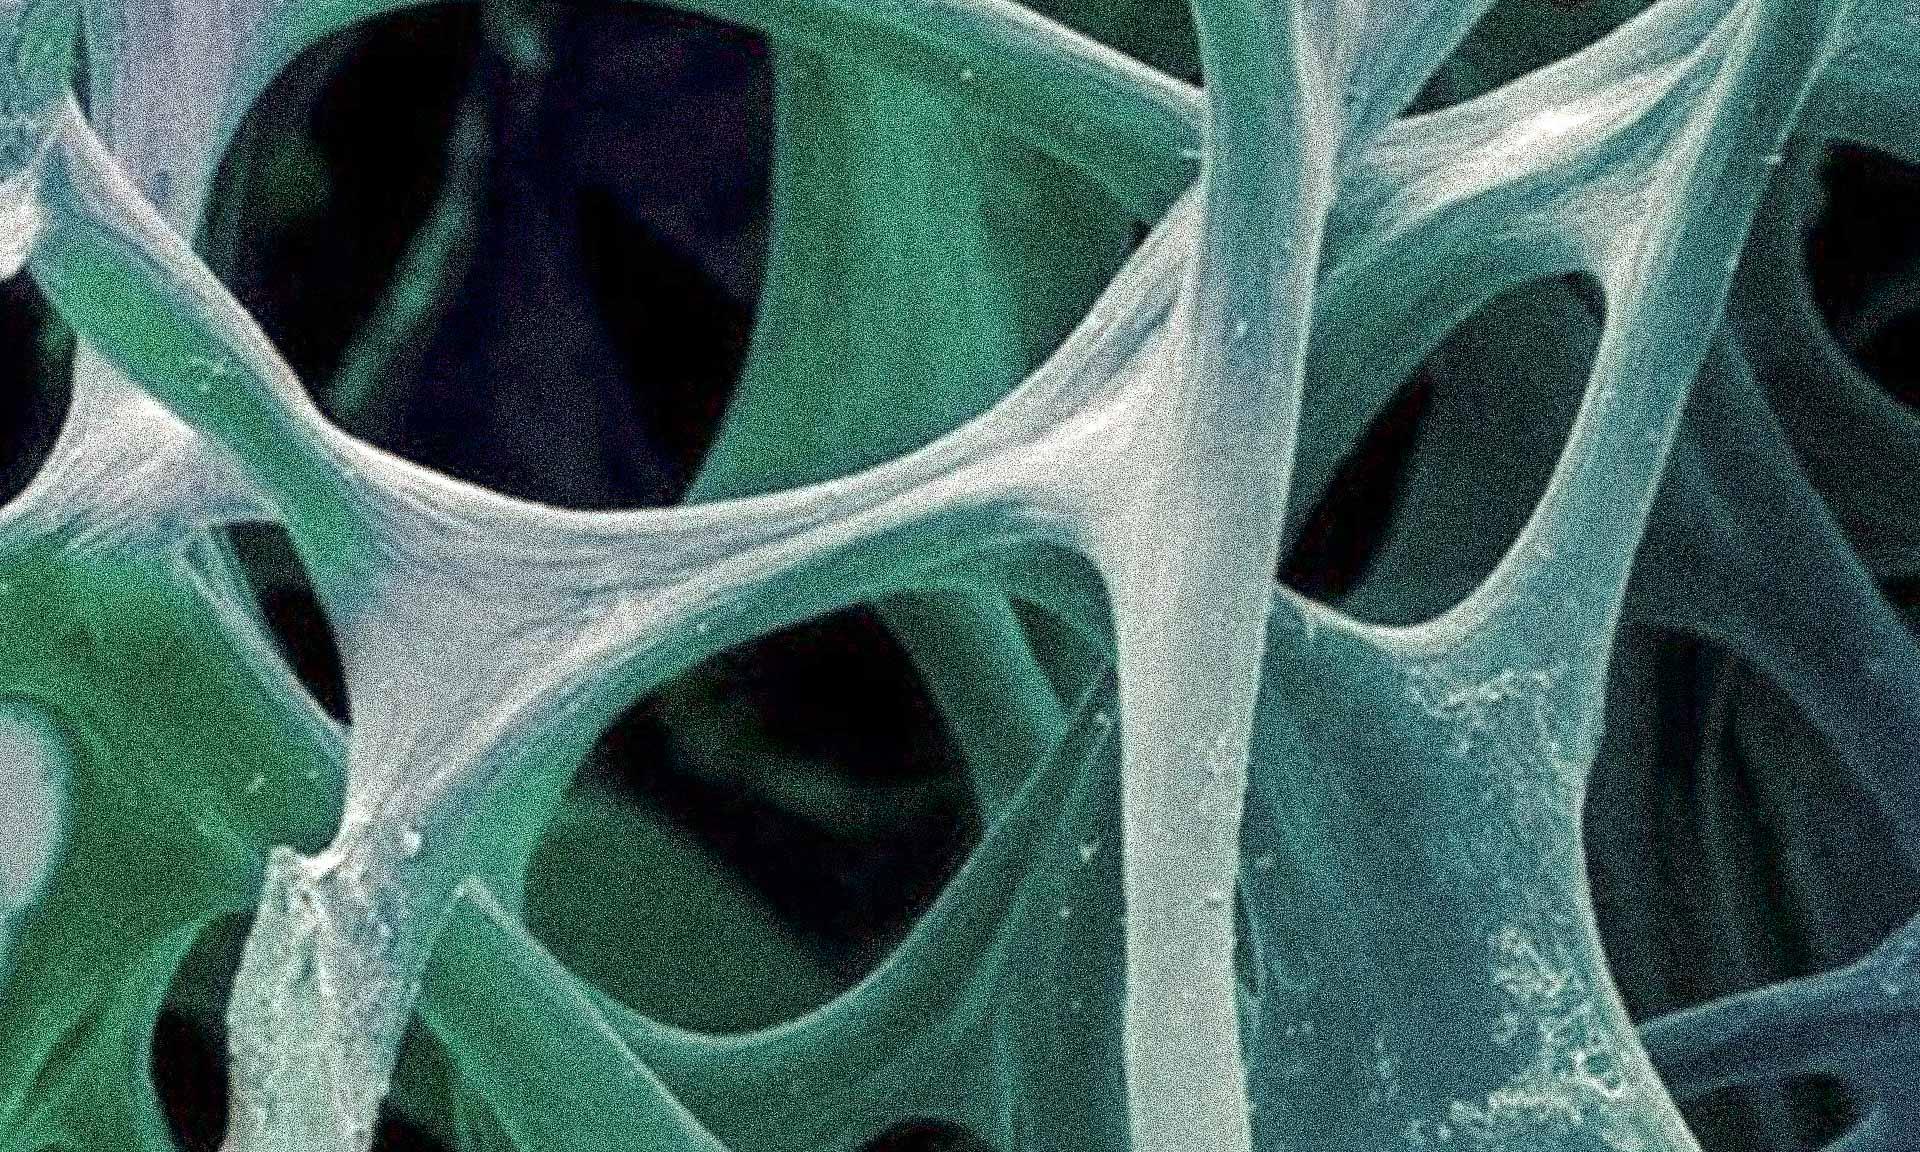 Osteoporosis - a 20th century disease